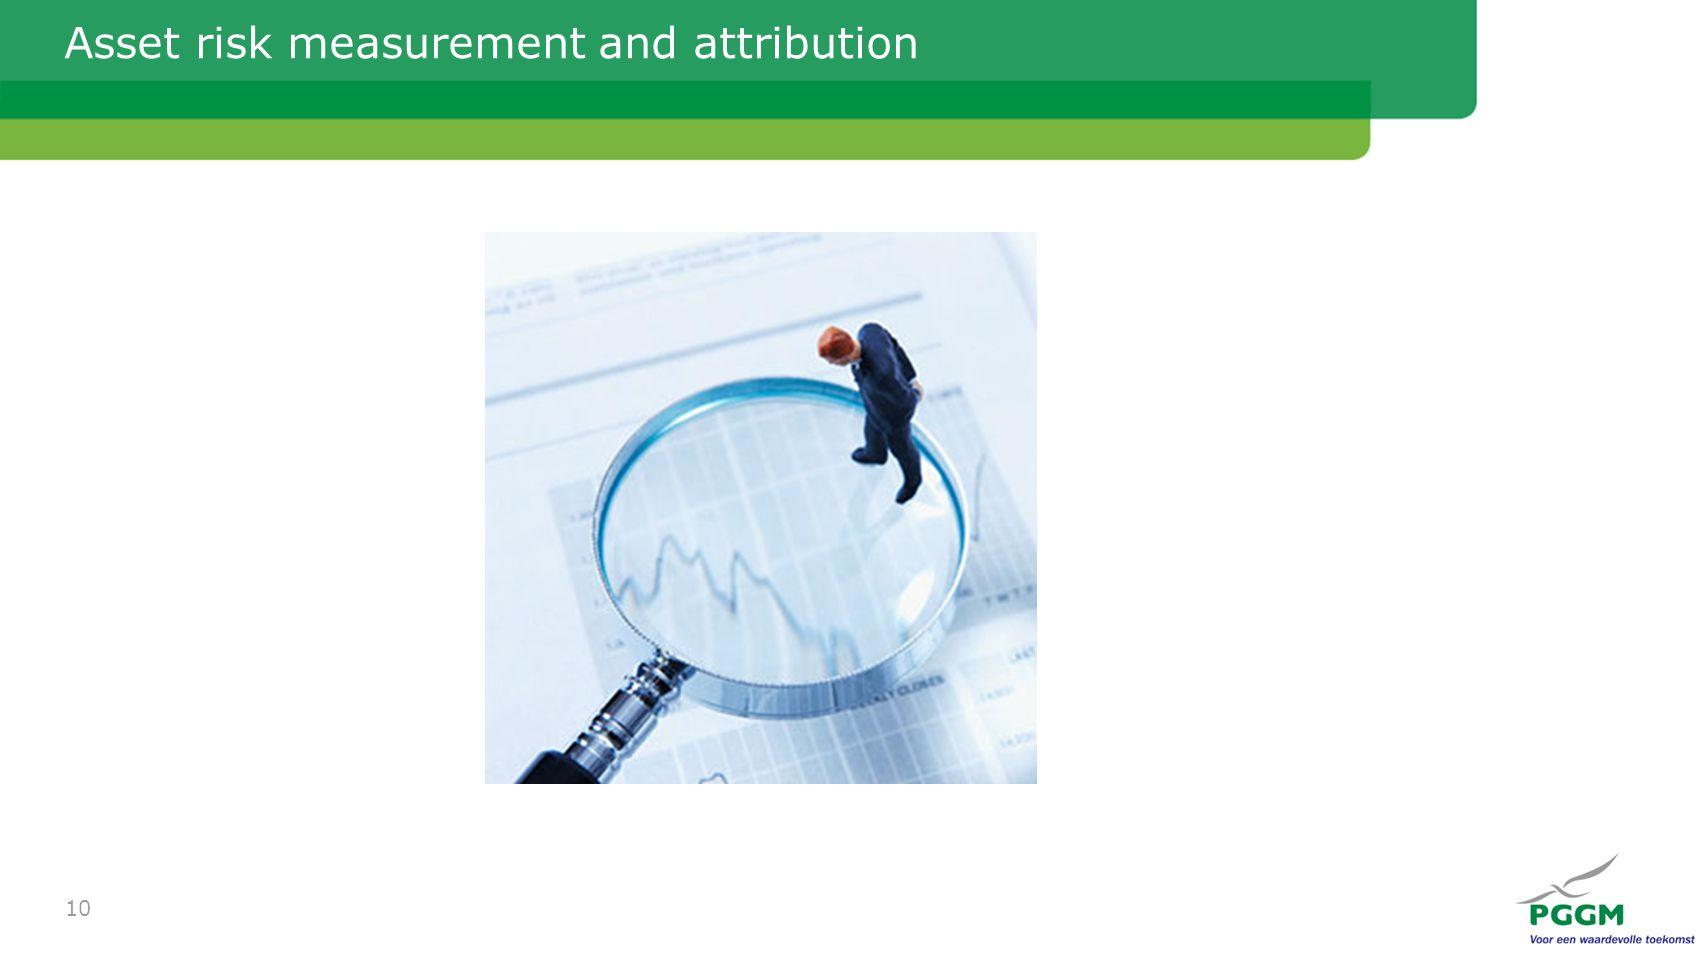 Asset risk measurement and attribution 10